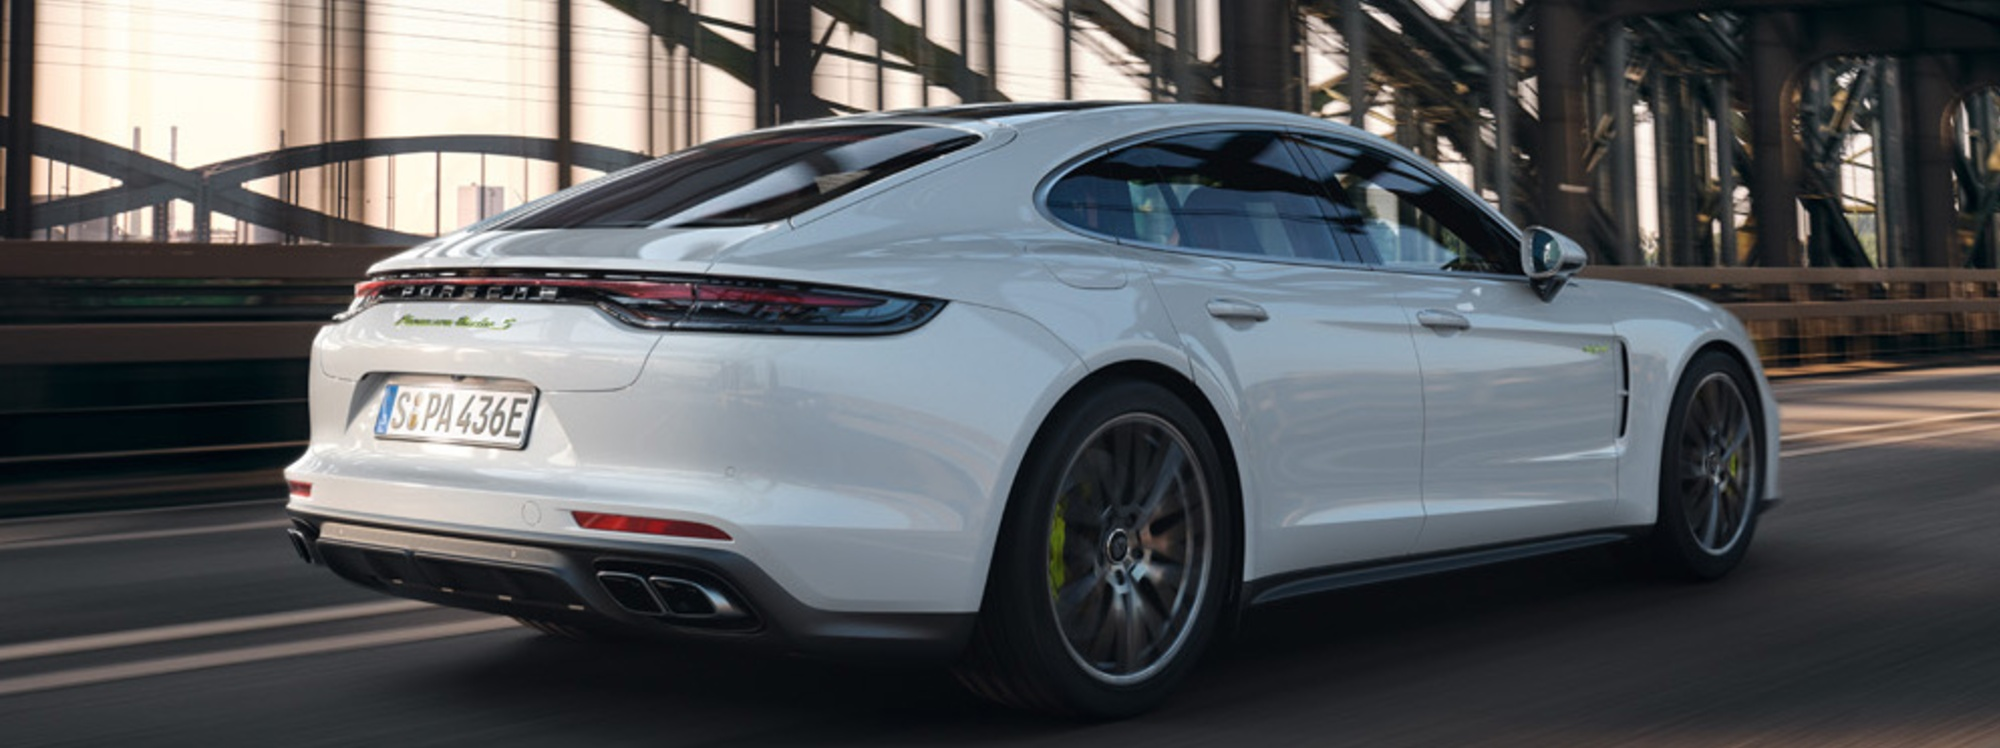 Porsche Panamera: 4 E-Hybrid y Turbo S E-Hybrid